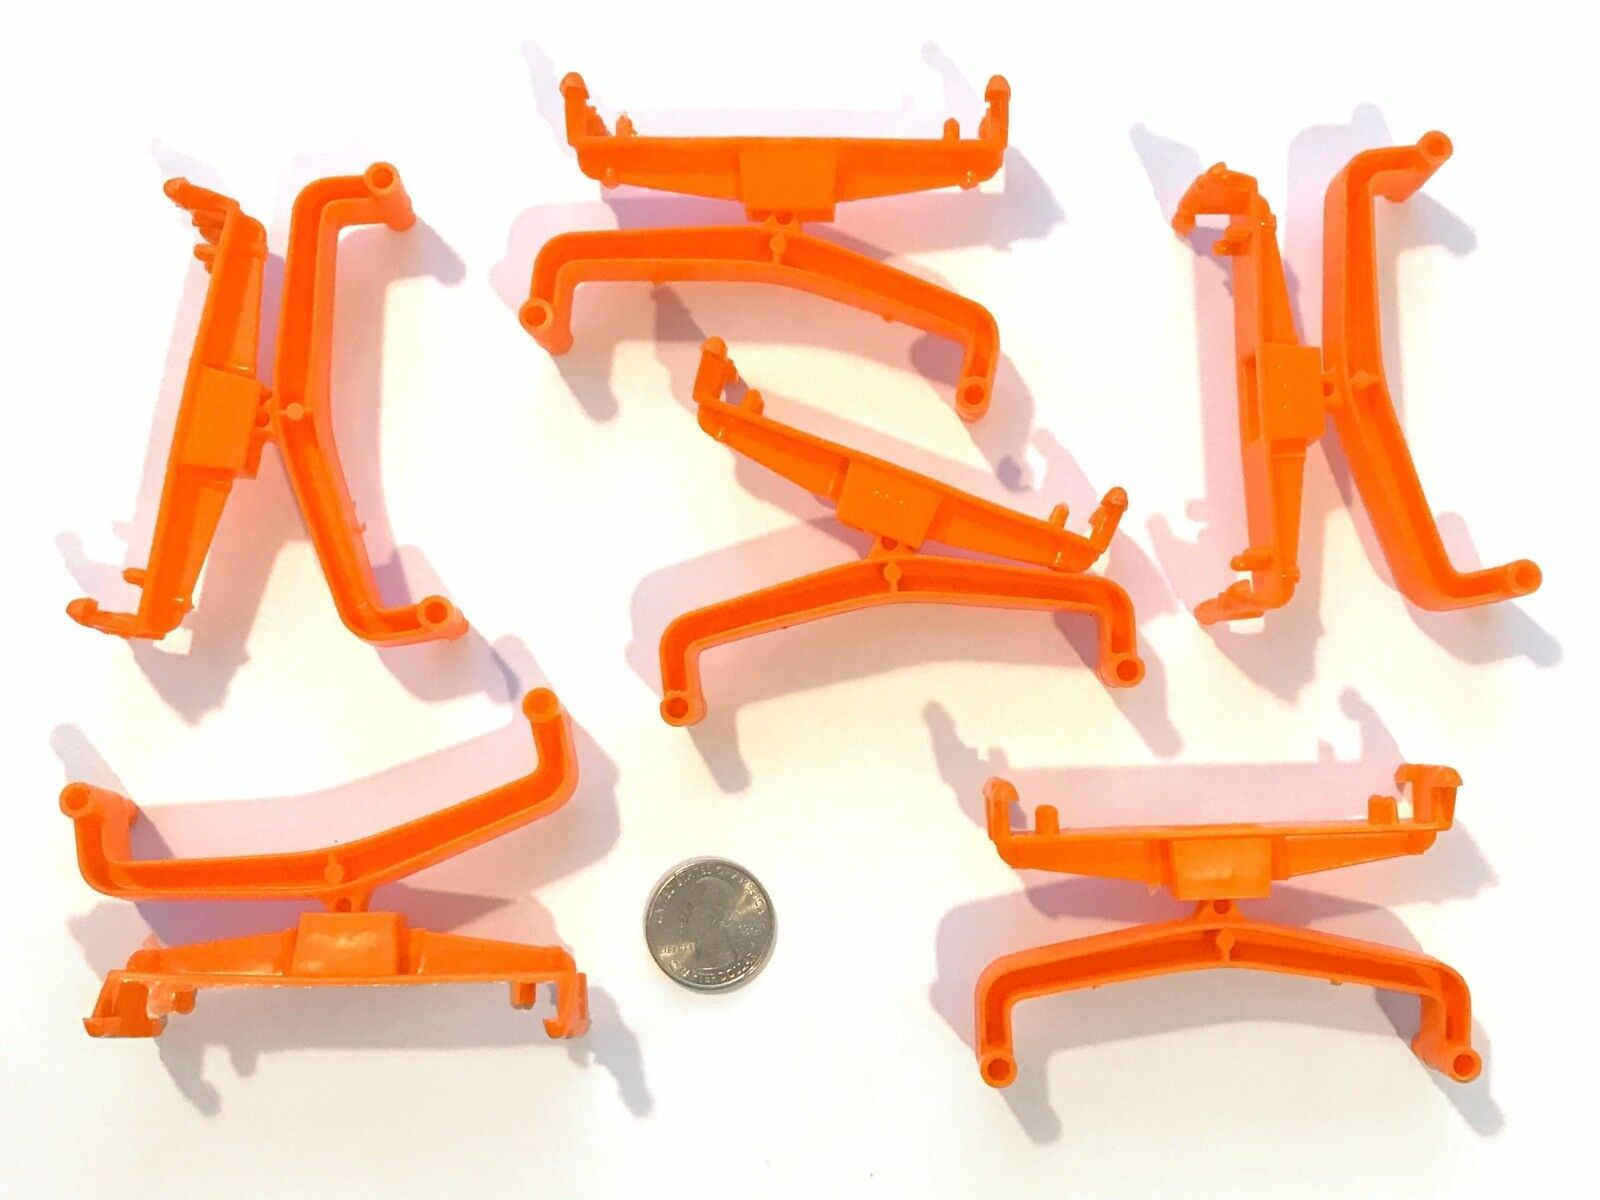 6 Aurora AFX Combination Slot Car Key Chain Great Tool!